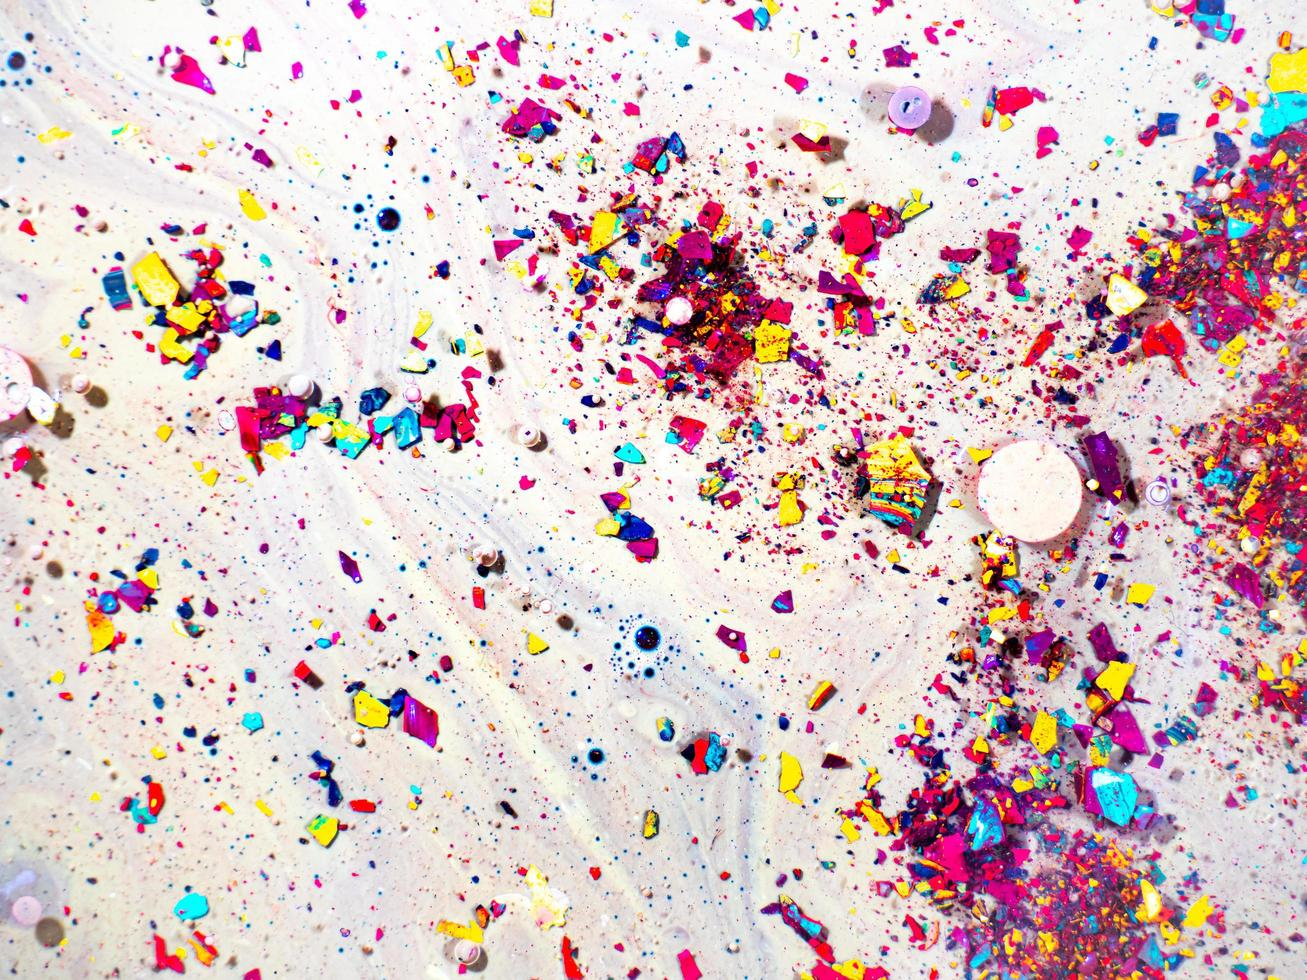 Candy mosaic texture photo